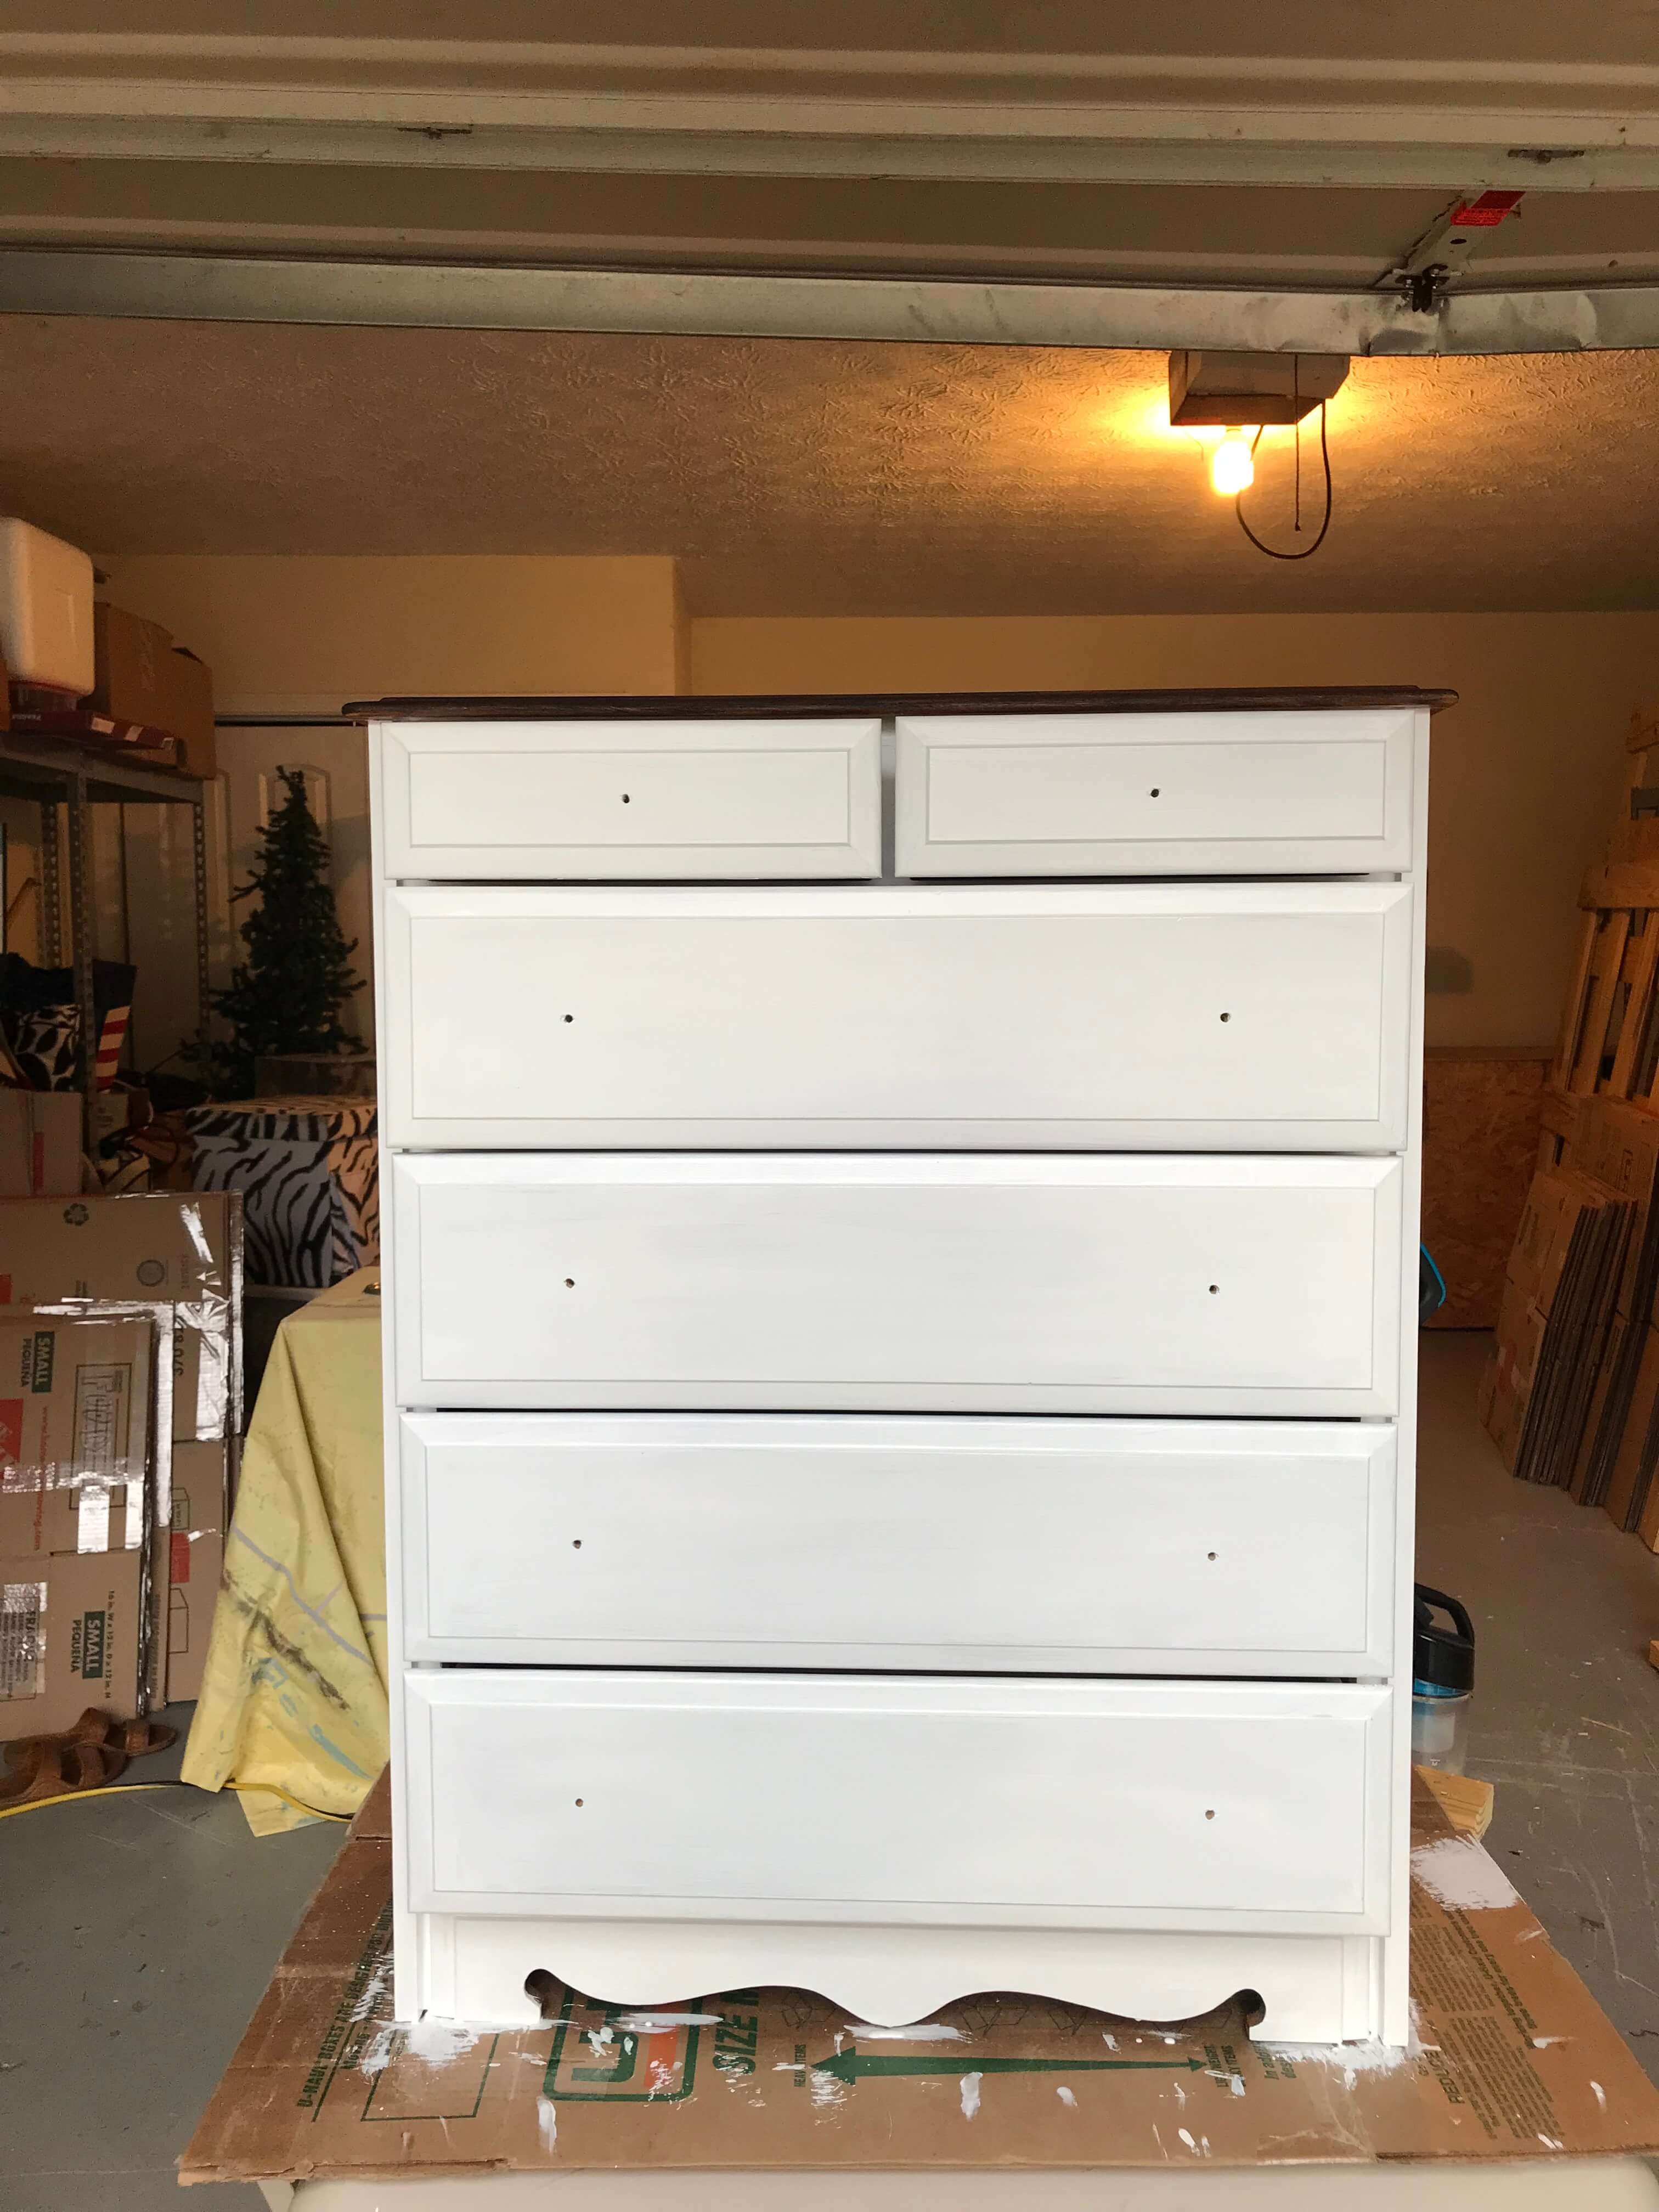 Farmhouse Guest Room Dresser Transformation / DIY Furniture Flip Before + After